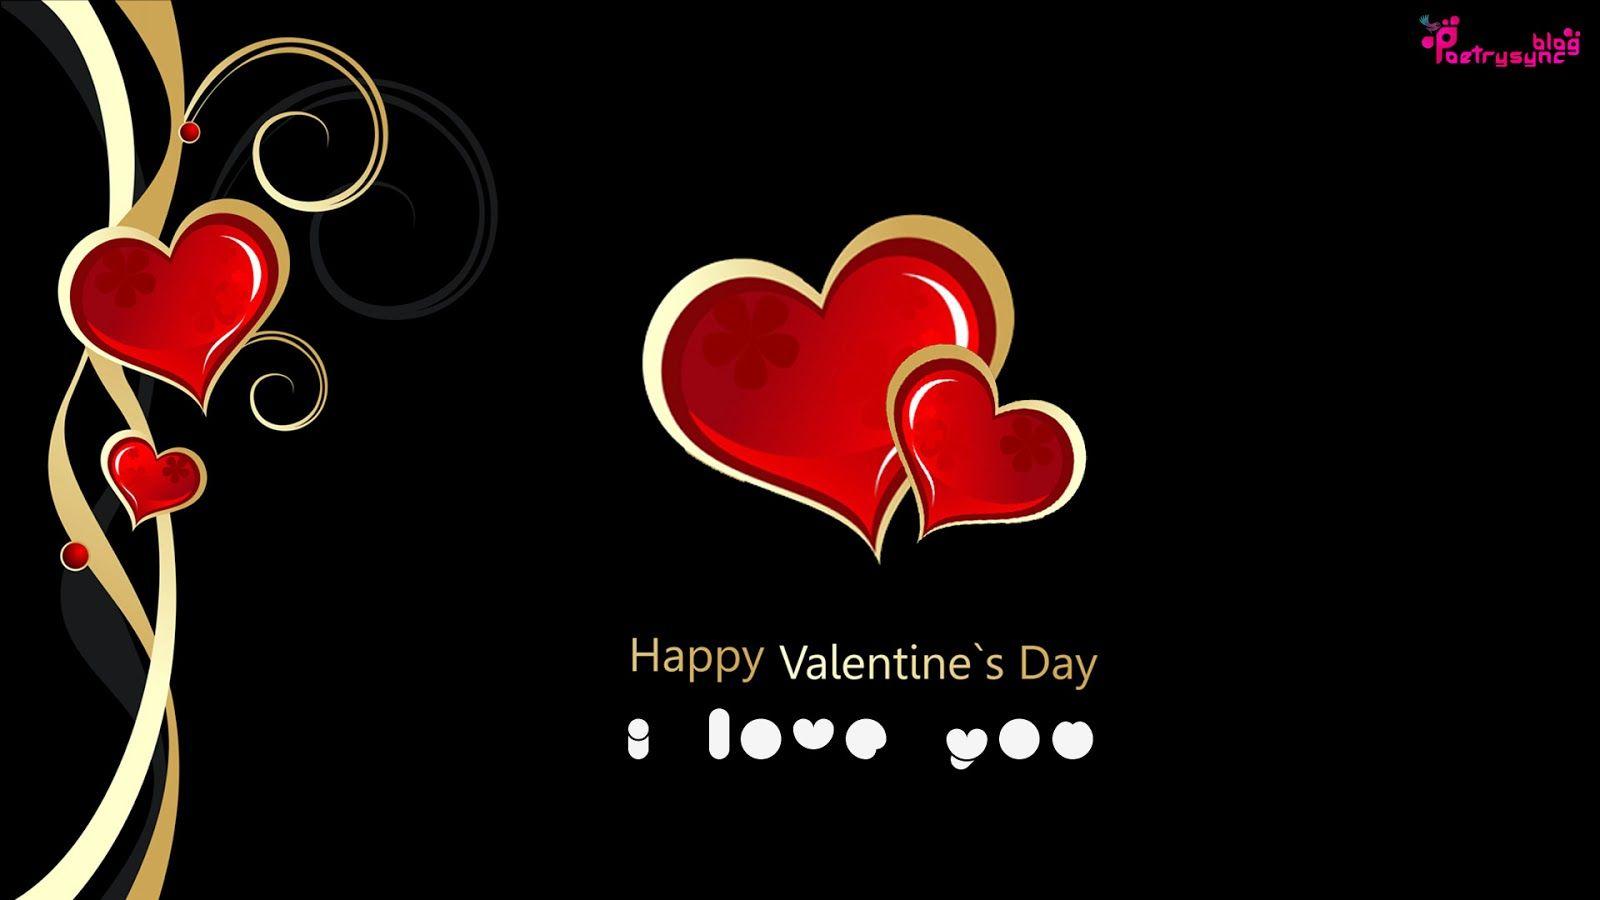 Happy Valentines Day 3d Heart In Red Colour Valentines Swirls Desktop Background Wallpaper Valentines Day Messages Happy Valentine I Love You Pictures